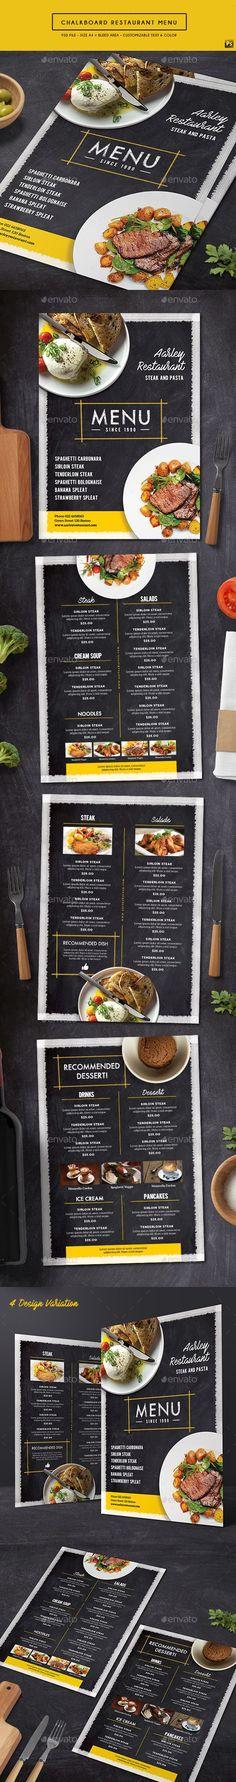 Chalkboard Restaurant Menu — Photoshop PSD #retro #style • Download ➝ https://graphicriver.net/item/chalkboard-restaurant-menu/19360869?ref=pxcr